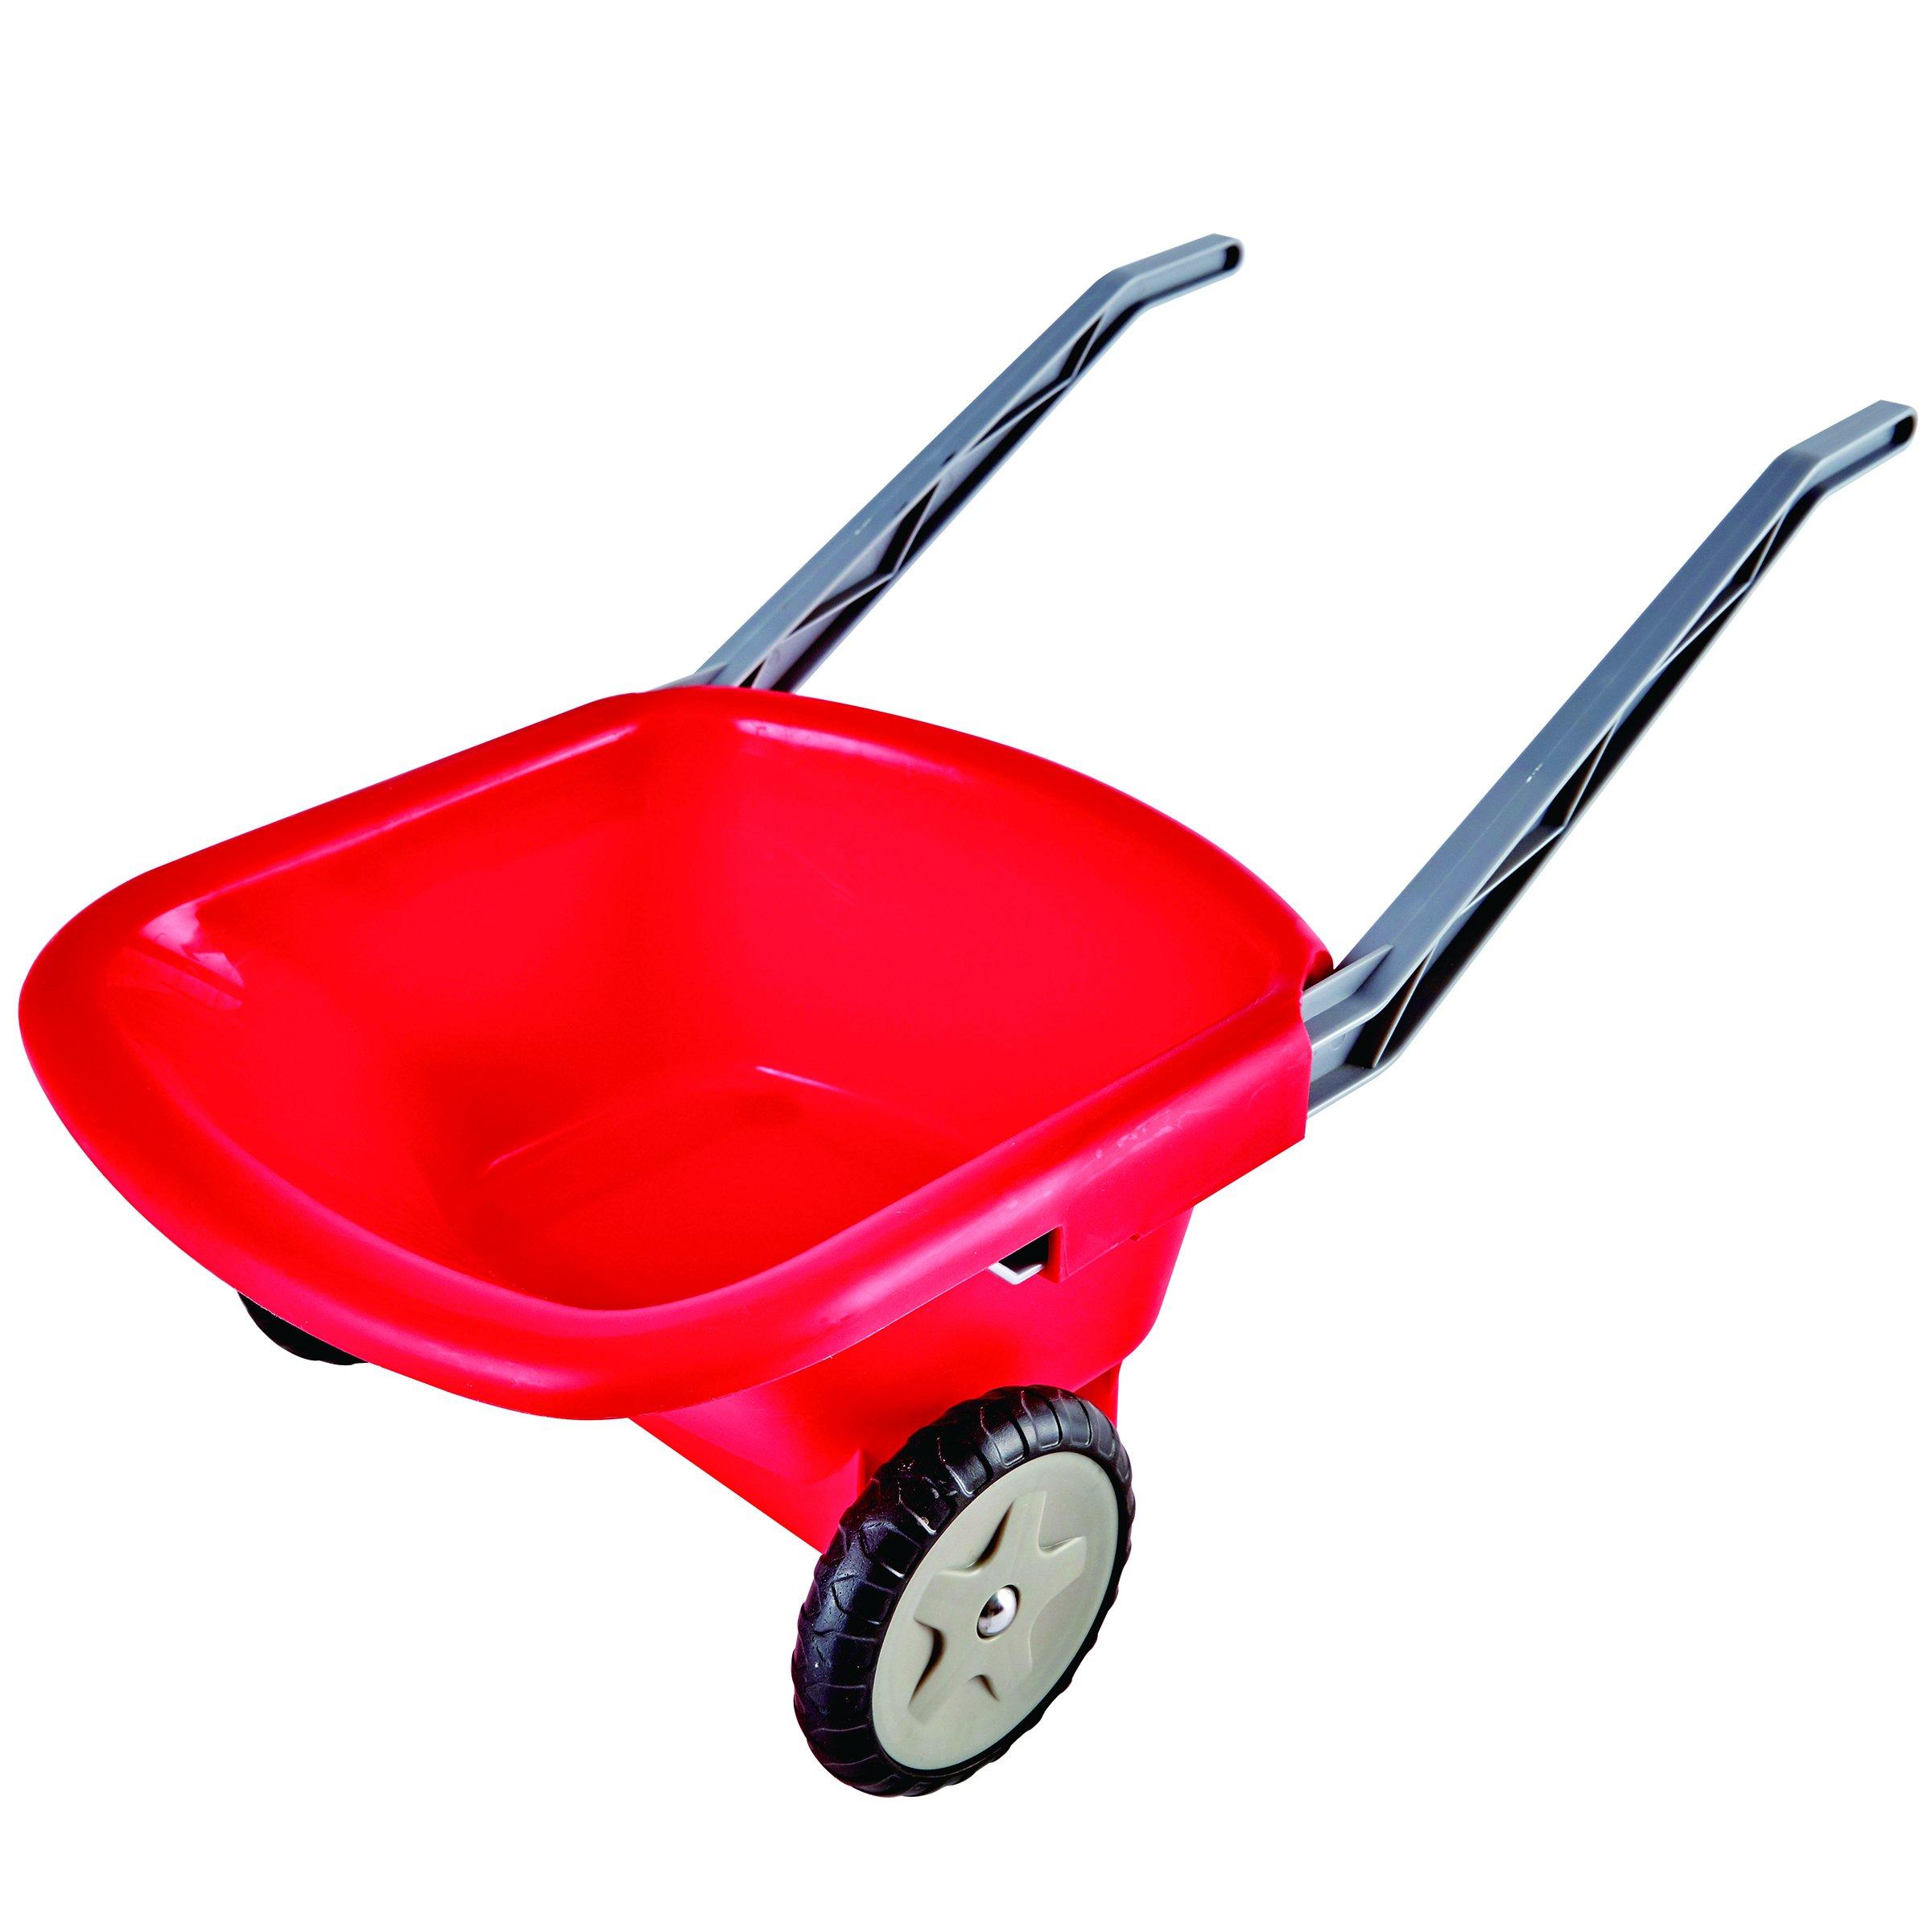 Hape Kids Beach & Garden Wheelbarrow, Red